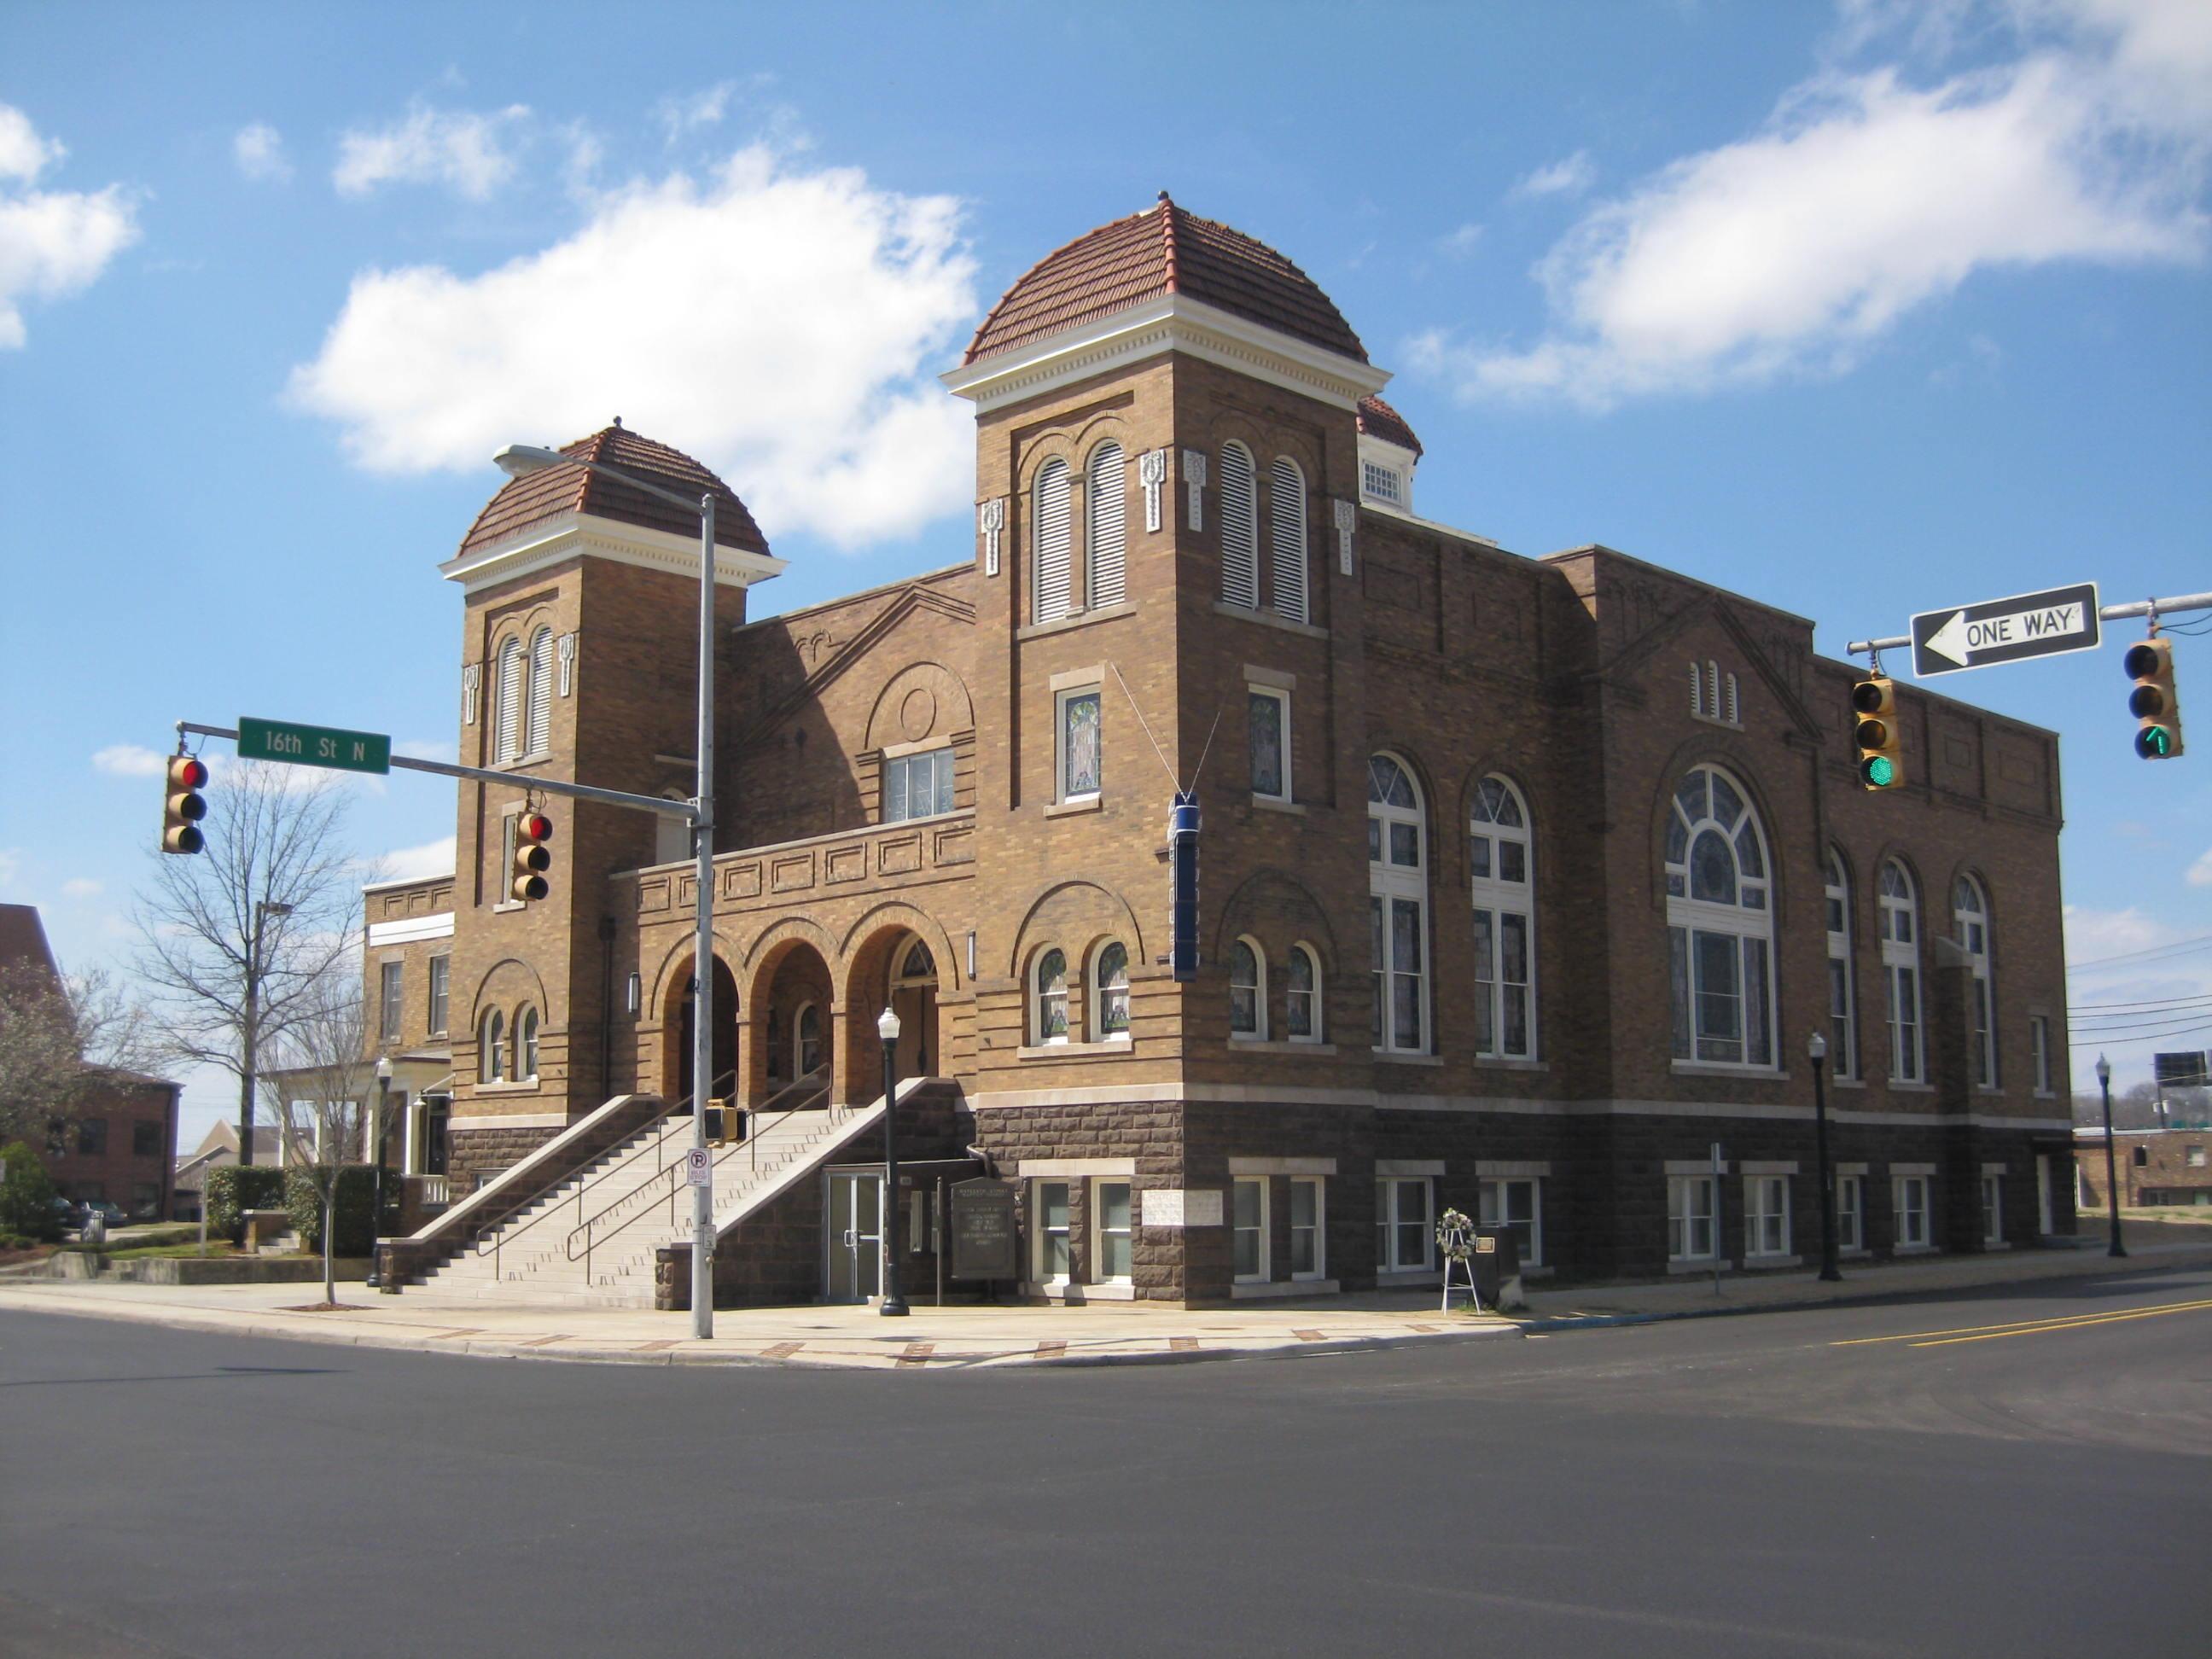 Closer view of the 16th Street Baptist Church